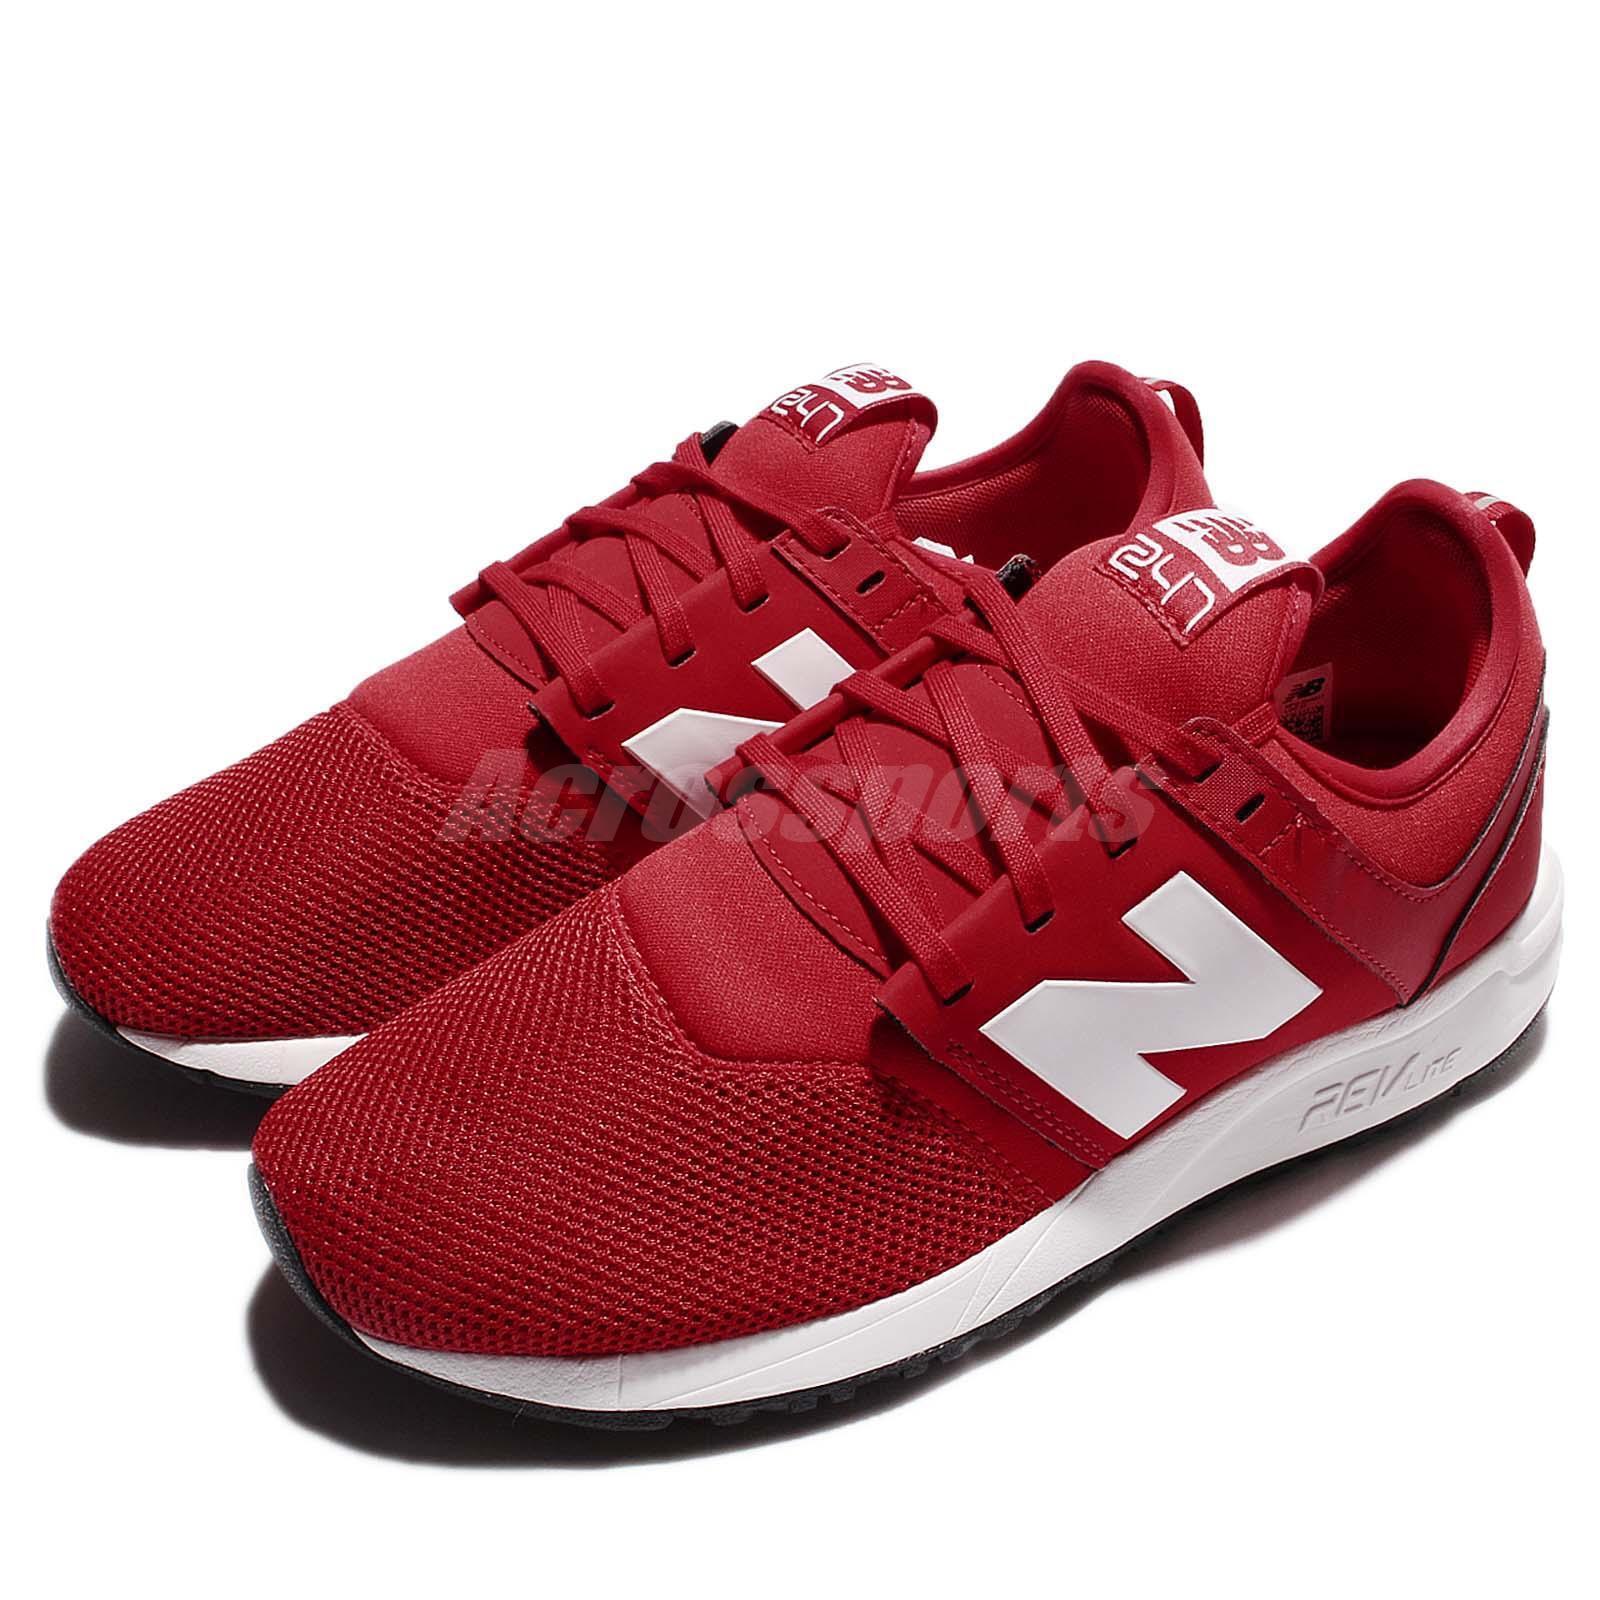 New Balance MRL247RW D rosso Lifestyle Men Running scarpe scarpe da ginnastica MRL247RWD